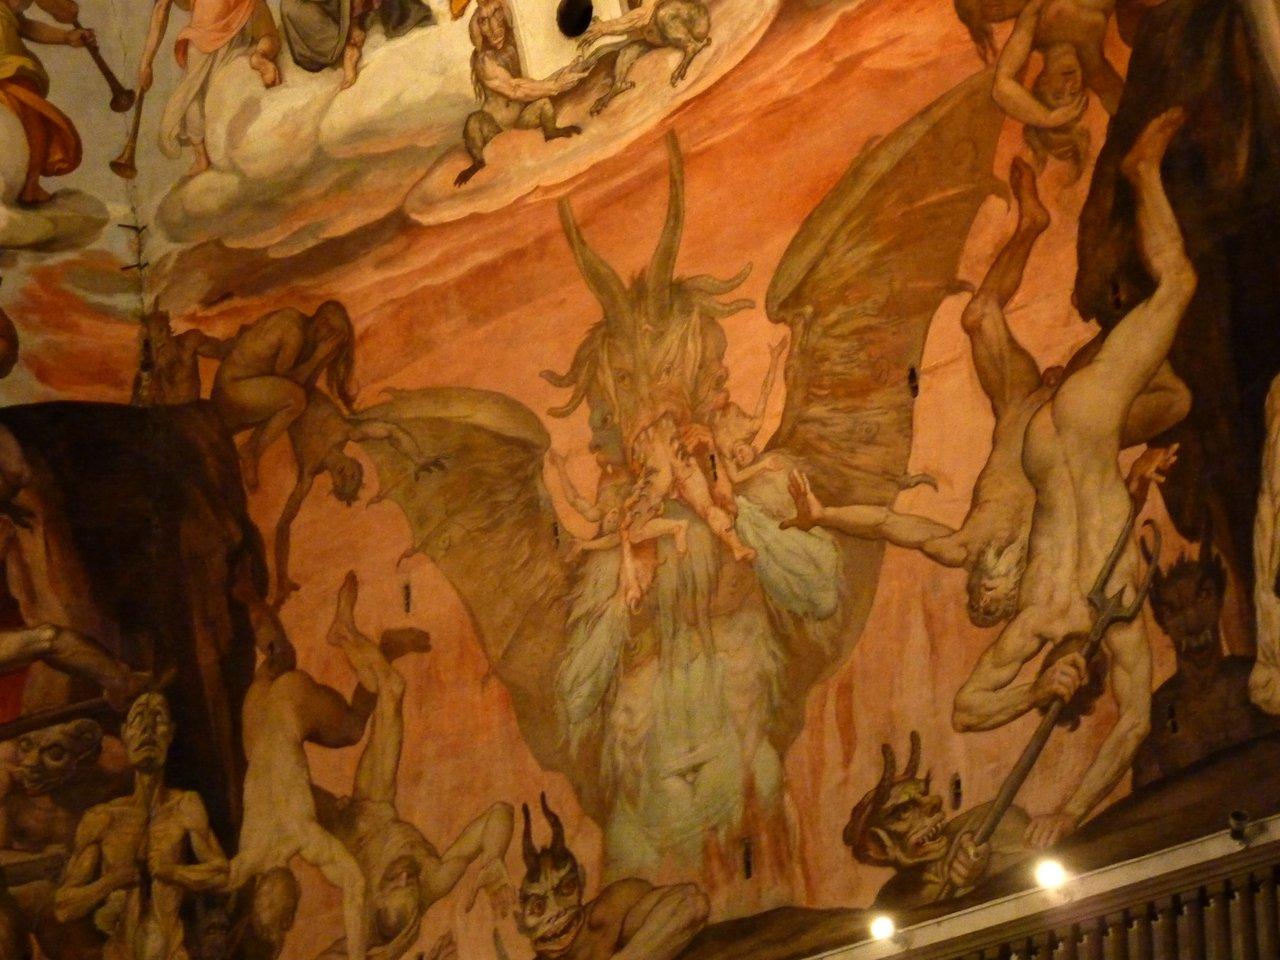 due giorni a firenze: L'inquietante Inferno di Brunelleschi